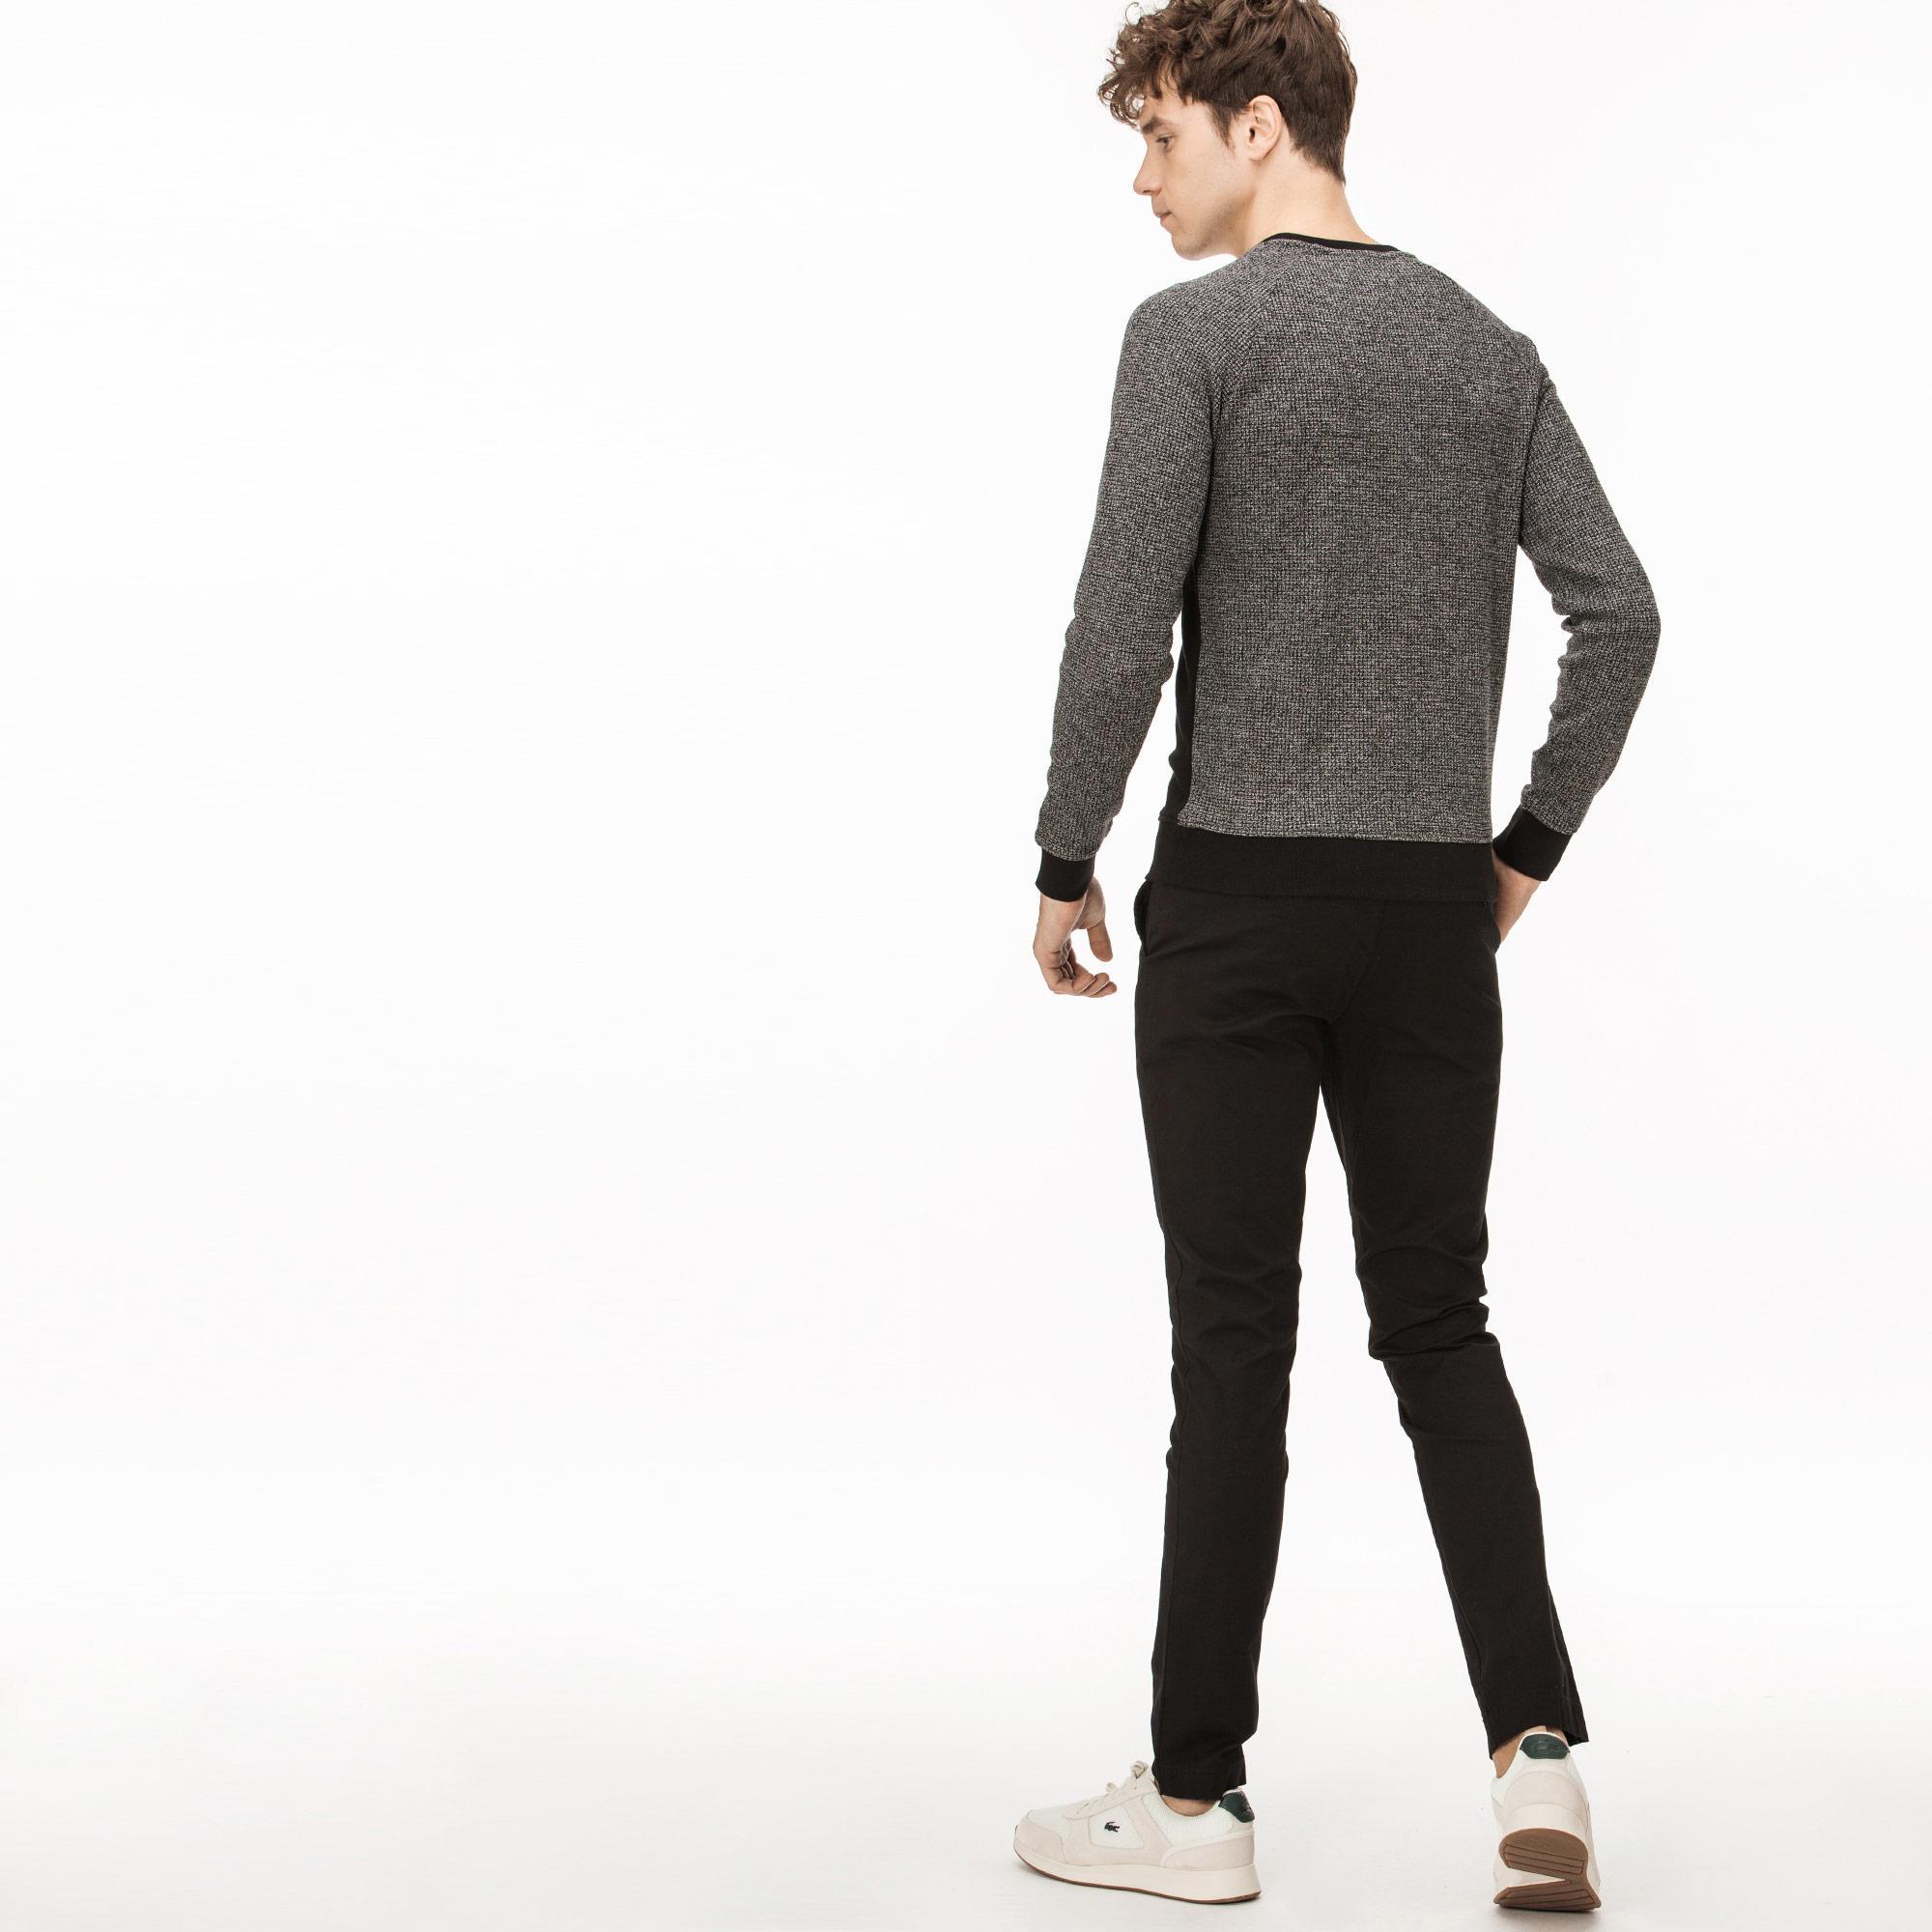 Lacoste Erkek Slim Fit Streç Gabardin Siyah Chino Pantolon